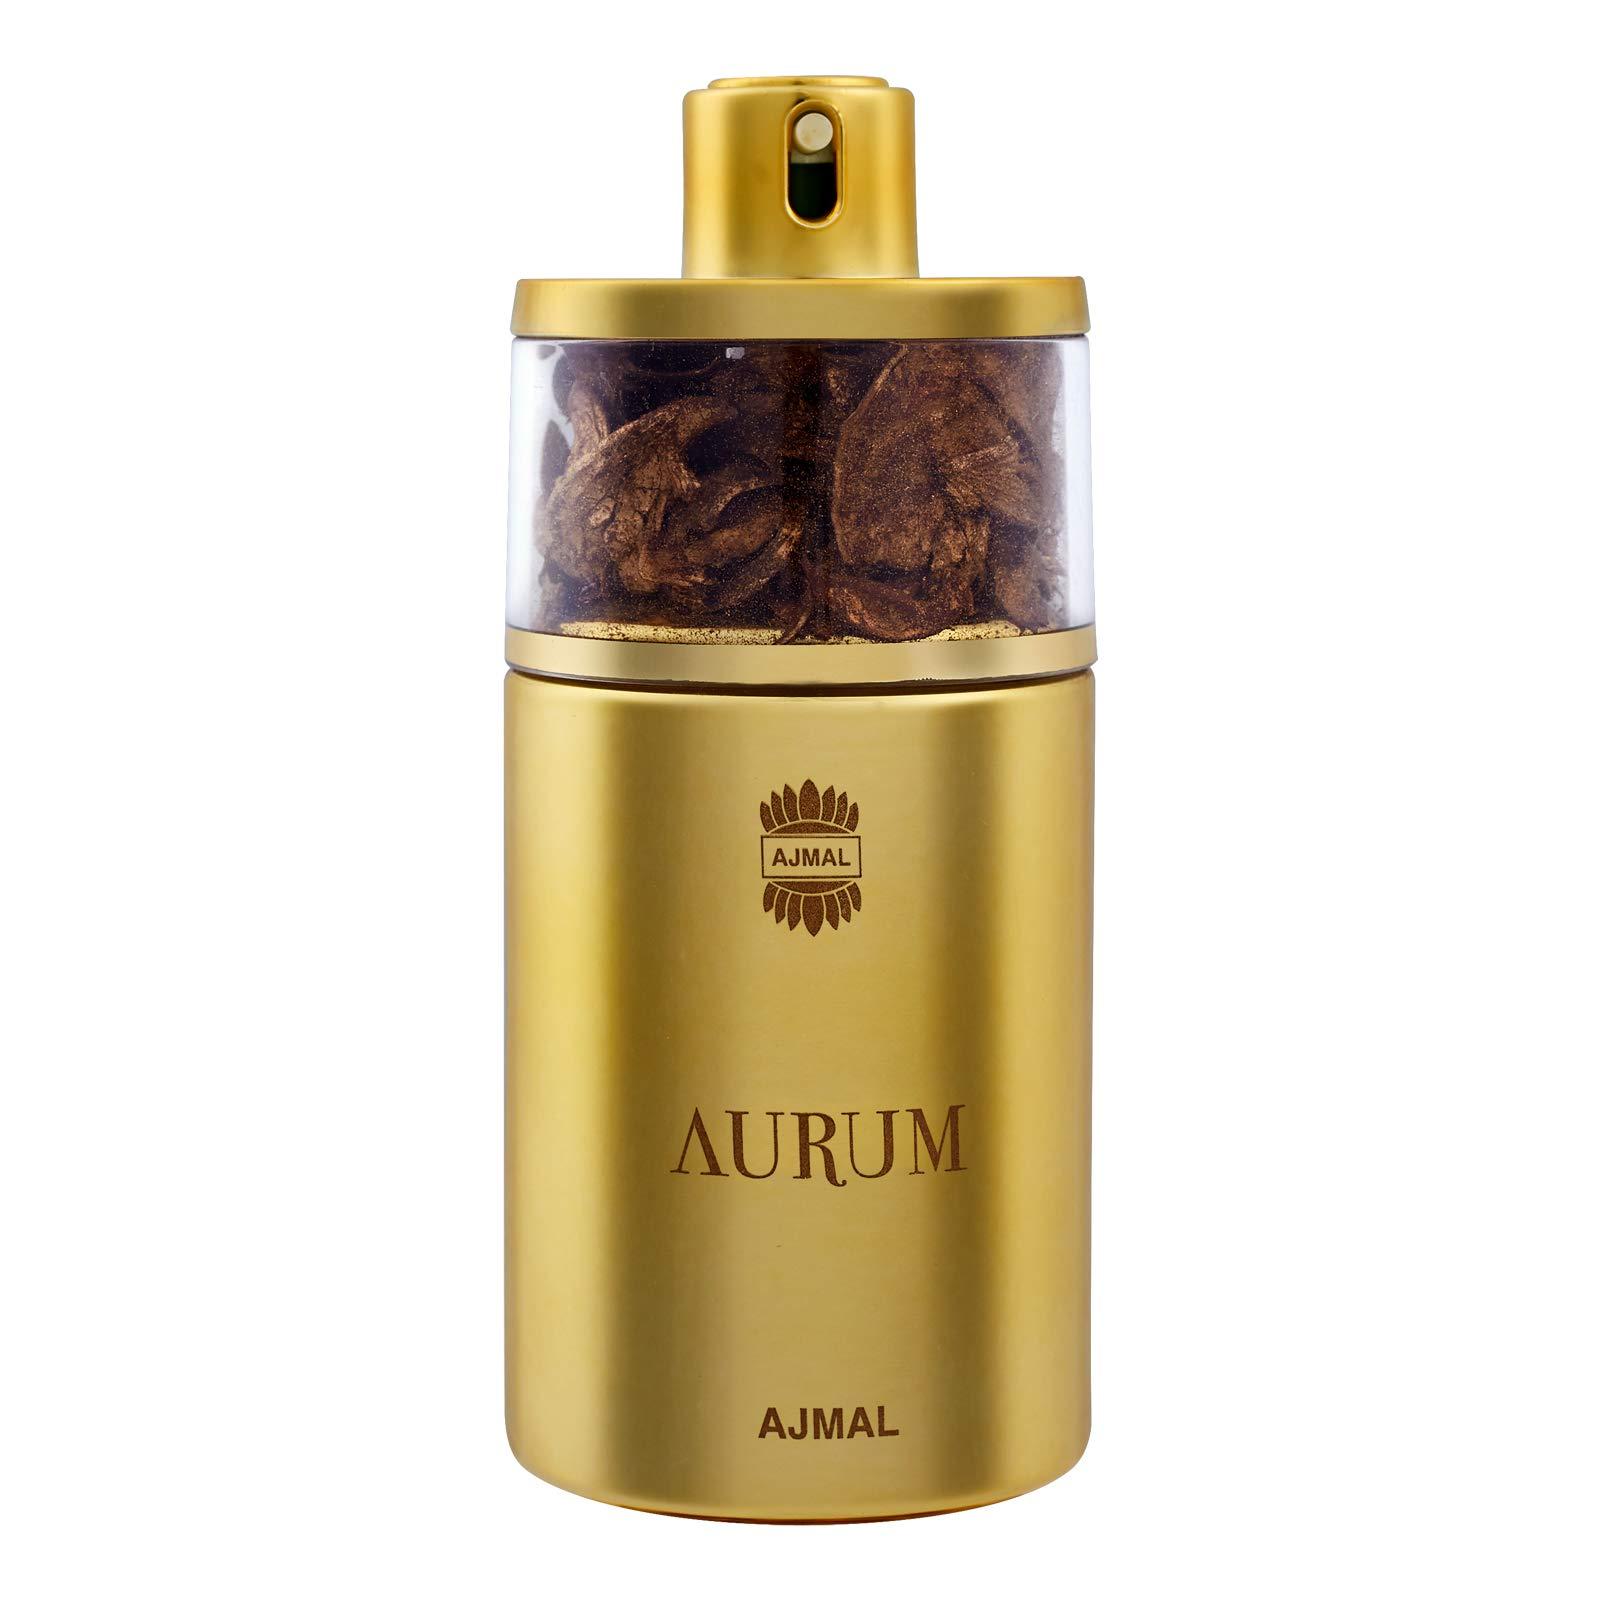 Aurum - Original by Ajmal - EDP 75 ml